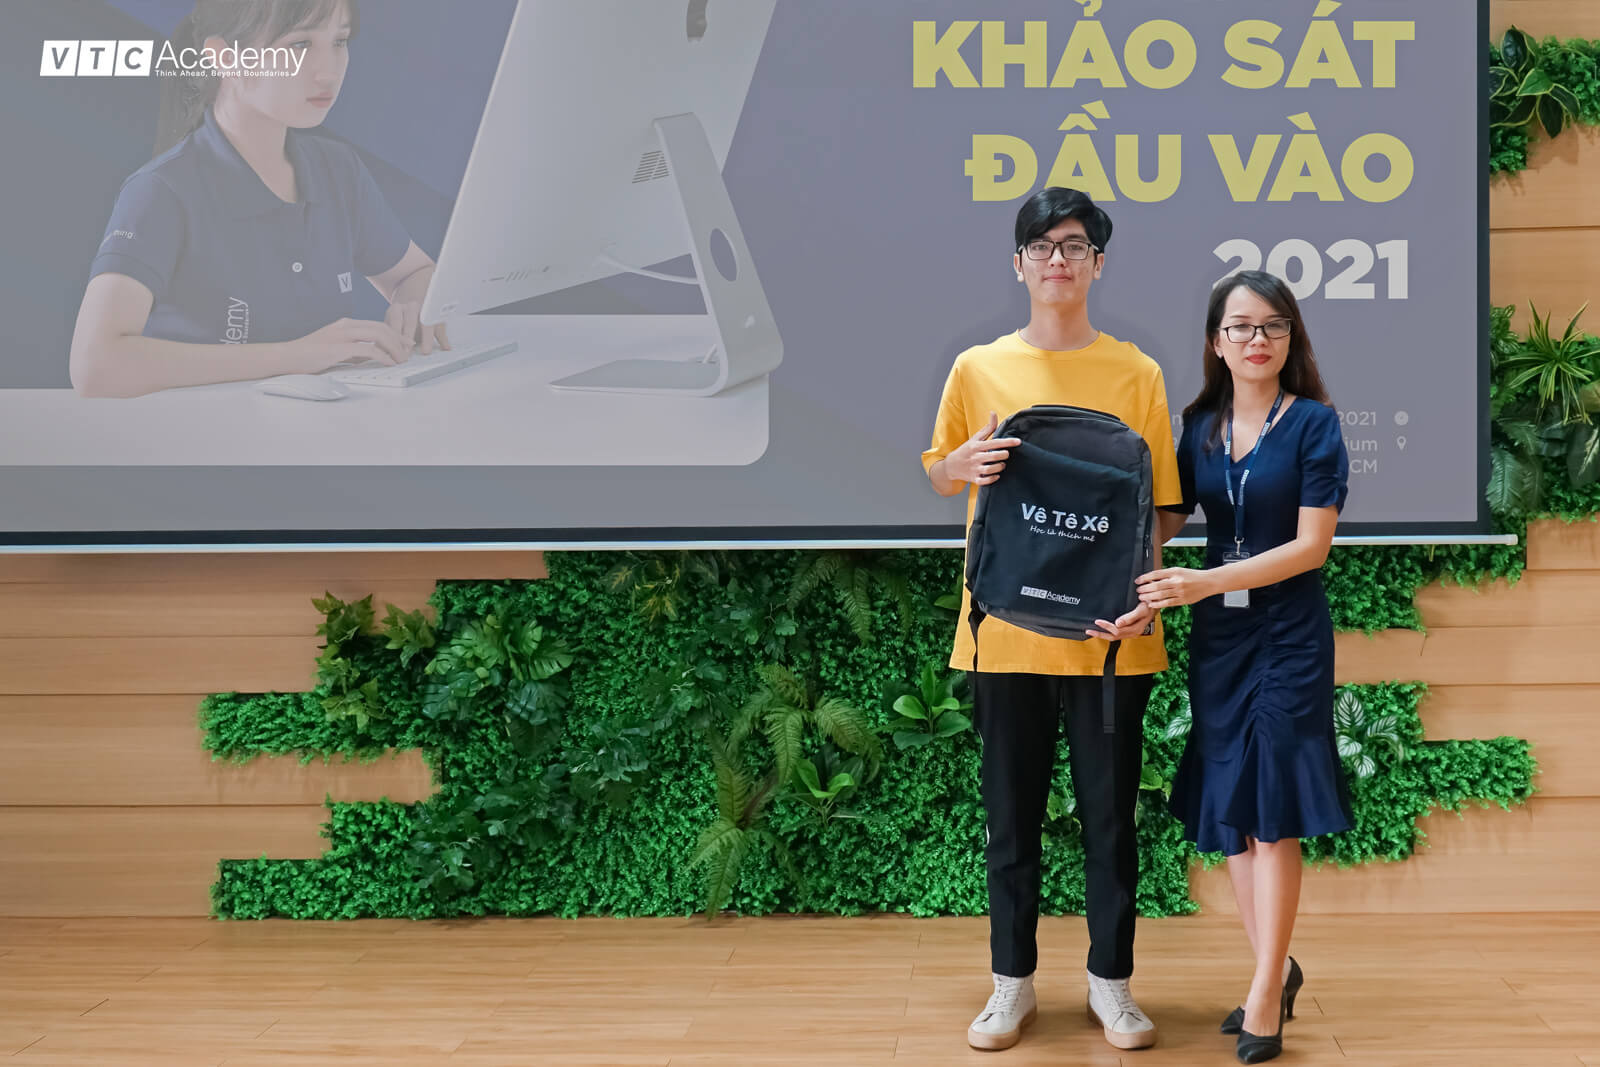 ky-thi-khao-sat-dau-vao-vtc-academy-1